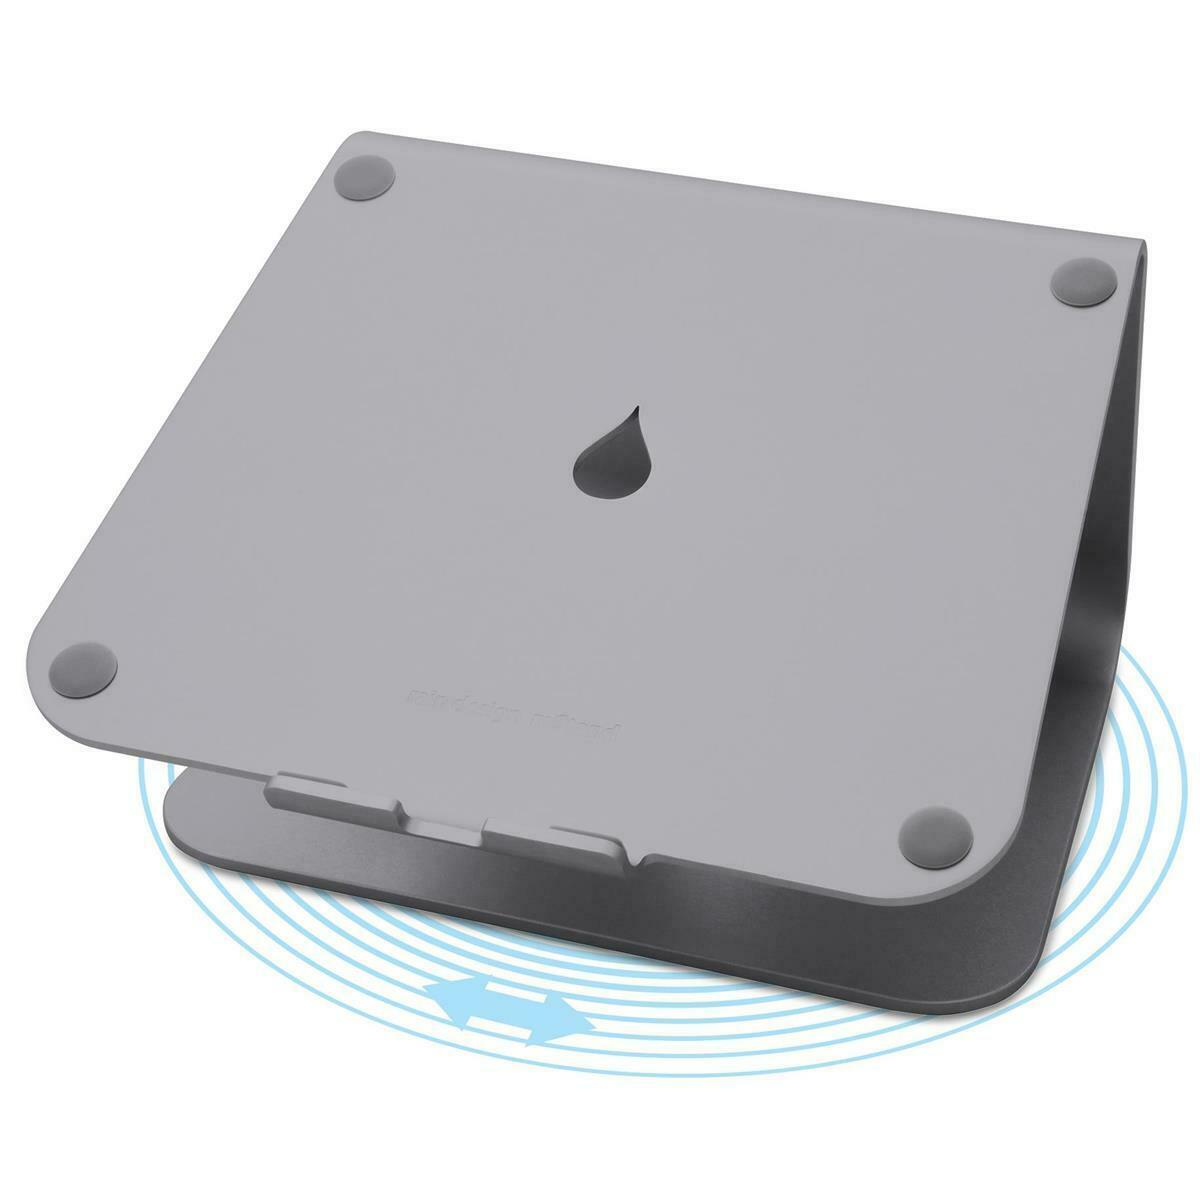 Ansamblu carcasa superioara, tastatura, touchpad si set boxe Dell Latitude 5591 dual pointing, layout US, fara iluminare